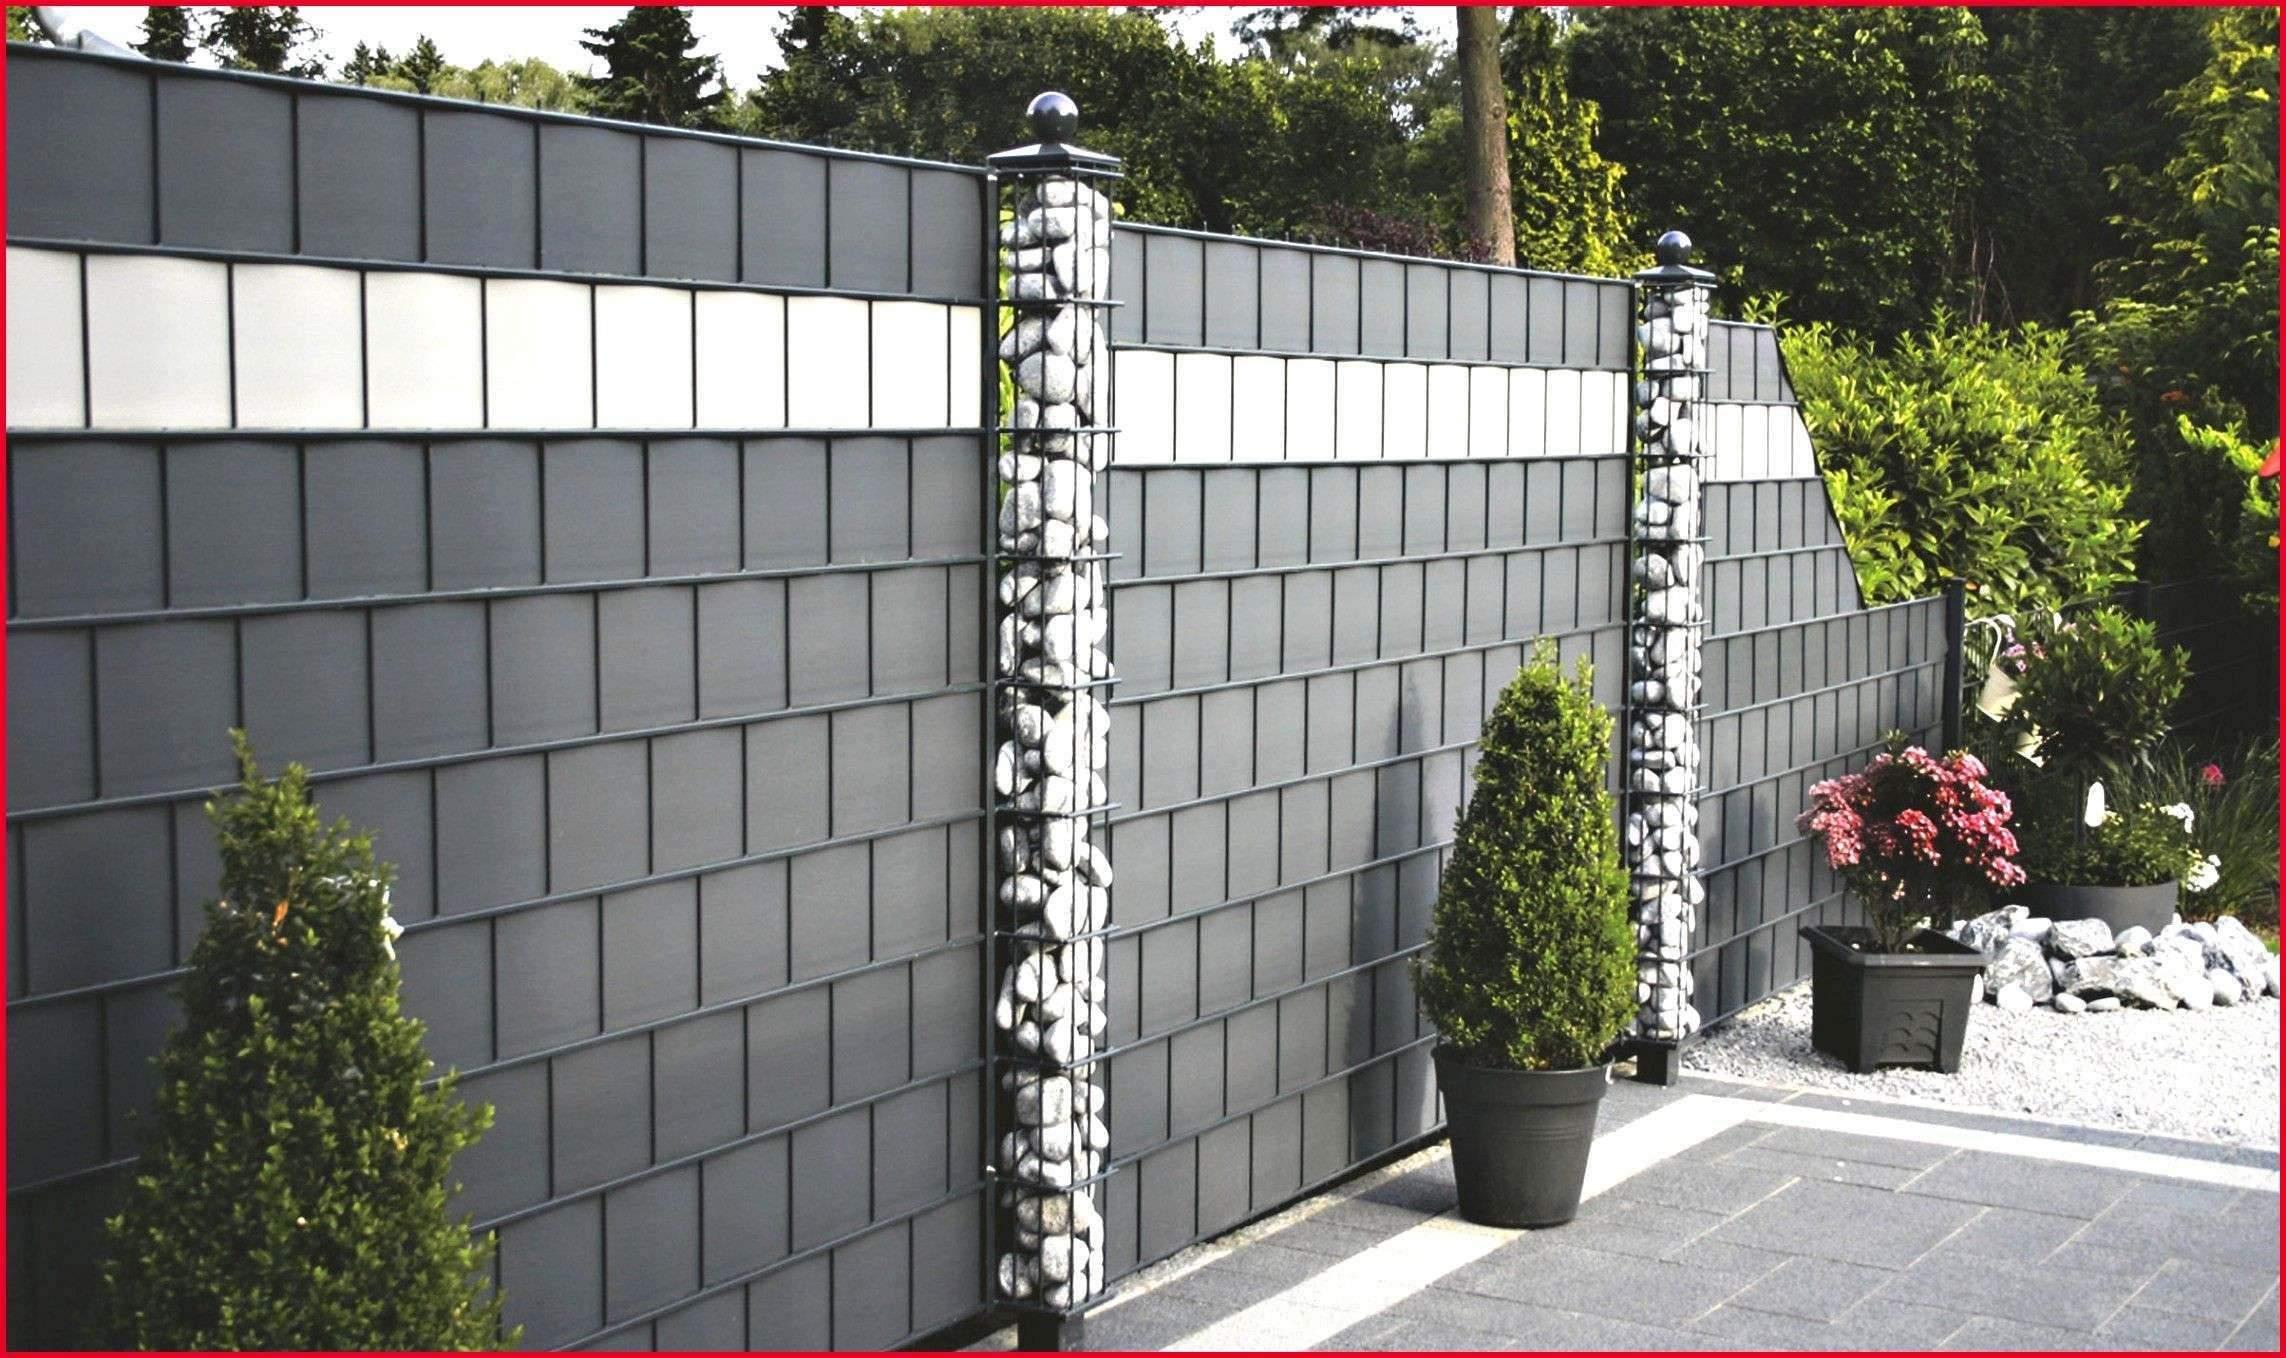 39 Schon Garten Sichtschutzzaun Luxus Garten Anlegen